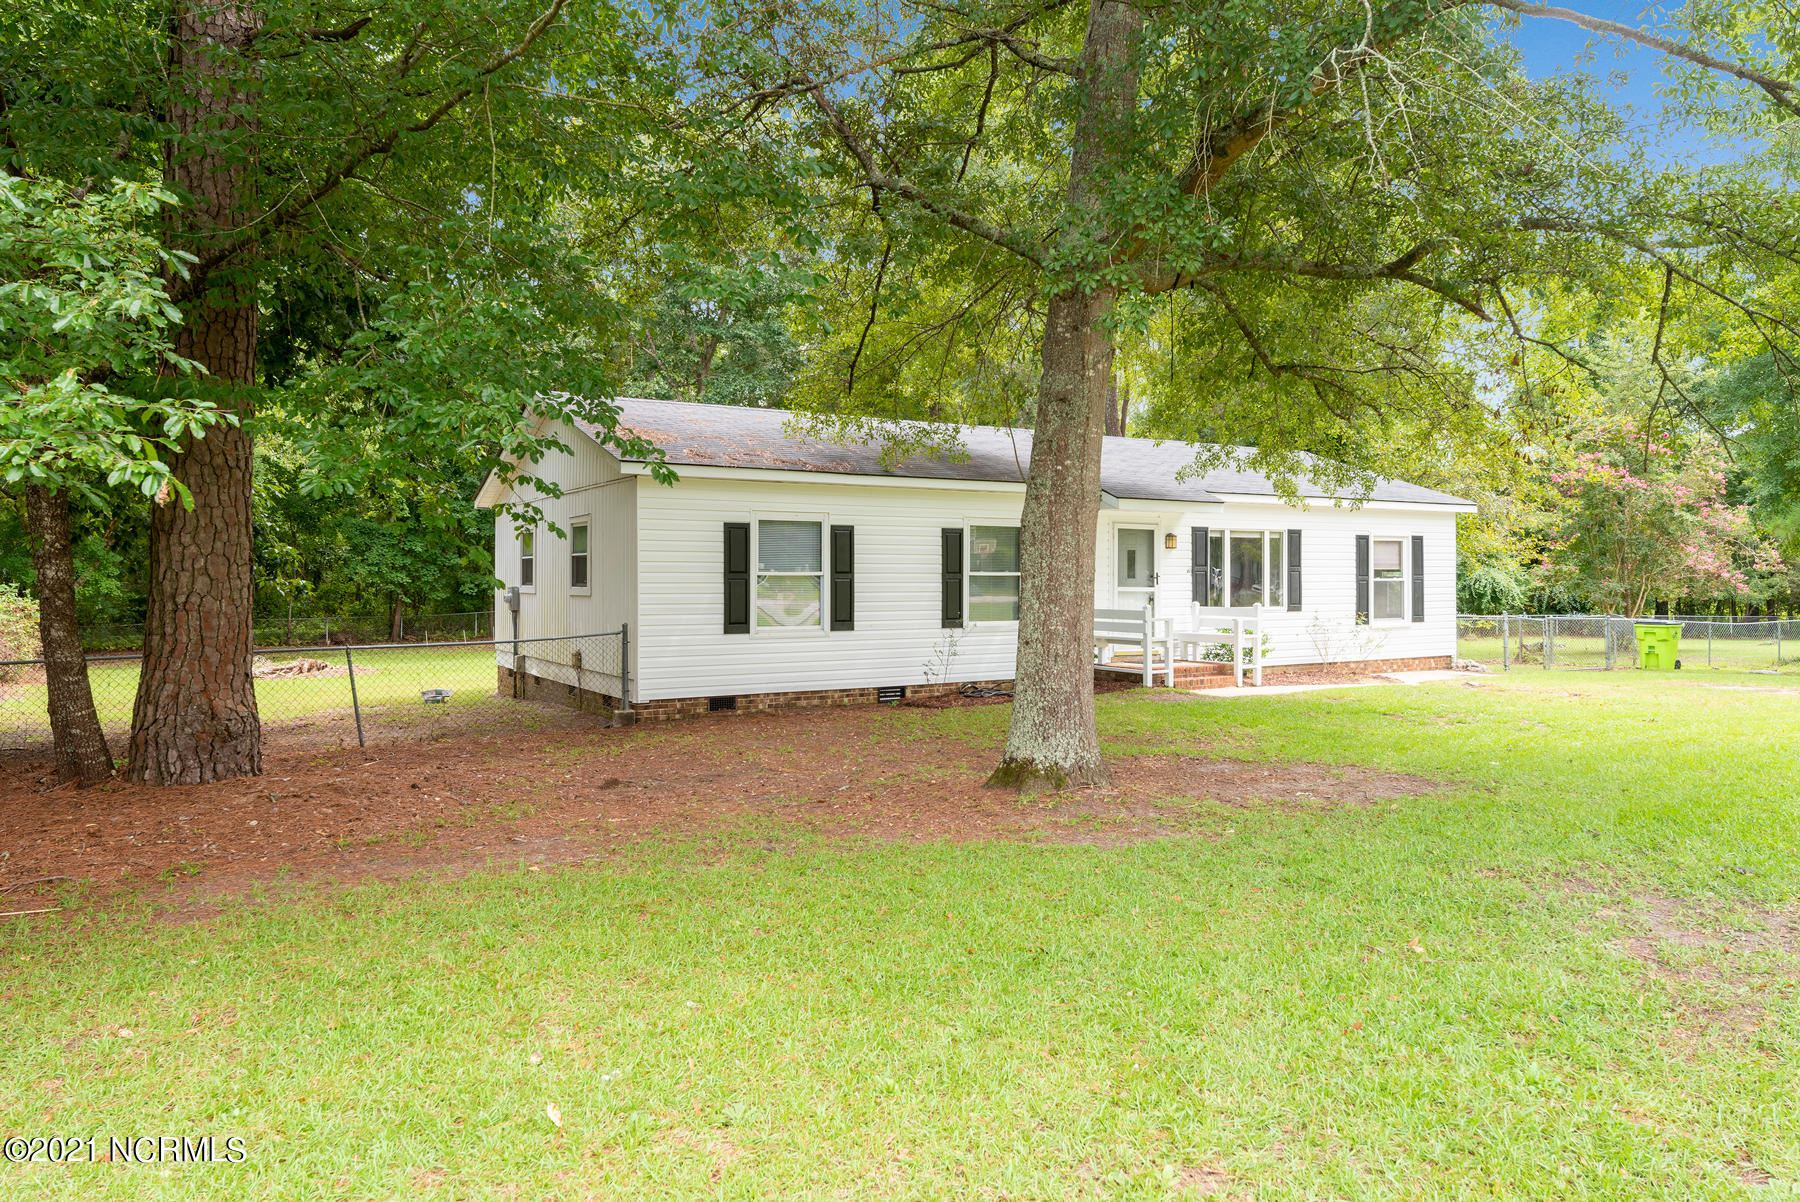 Photo of 185 Chips Road, Vanceboro, NC 28586 (MLS # 100284069)